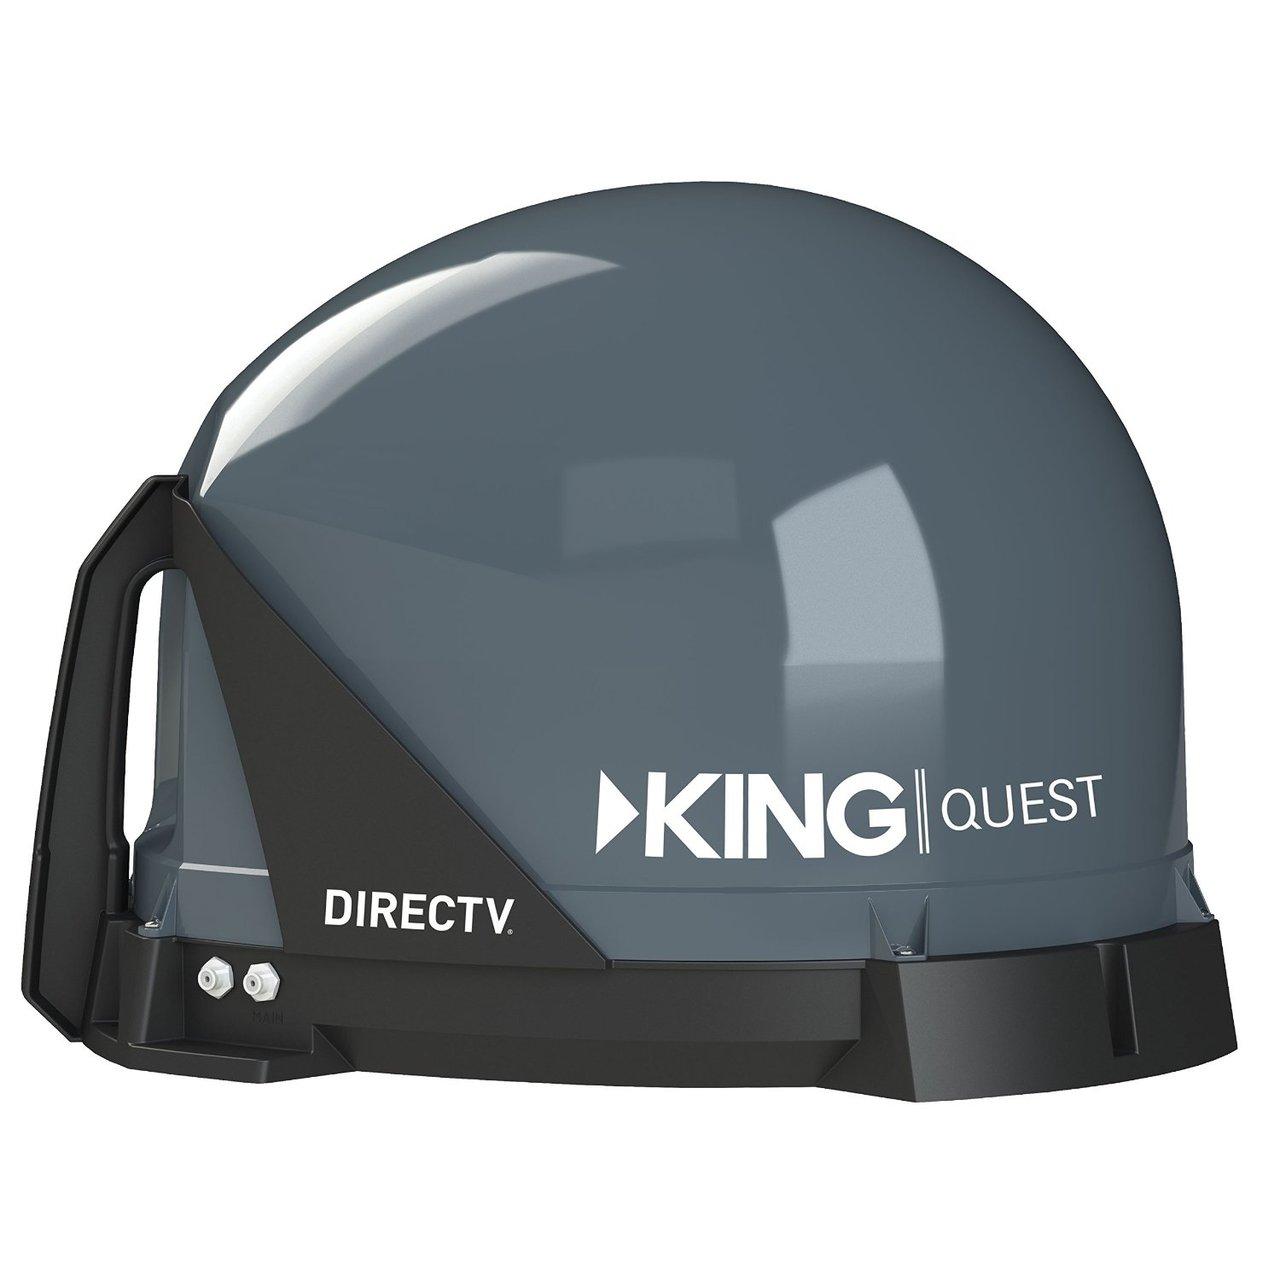 King quest vq4100 portable satellite tv antenna for directv king quest vq4100 portable satellite tv dish for directv publicscrutiny Images